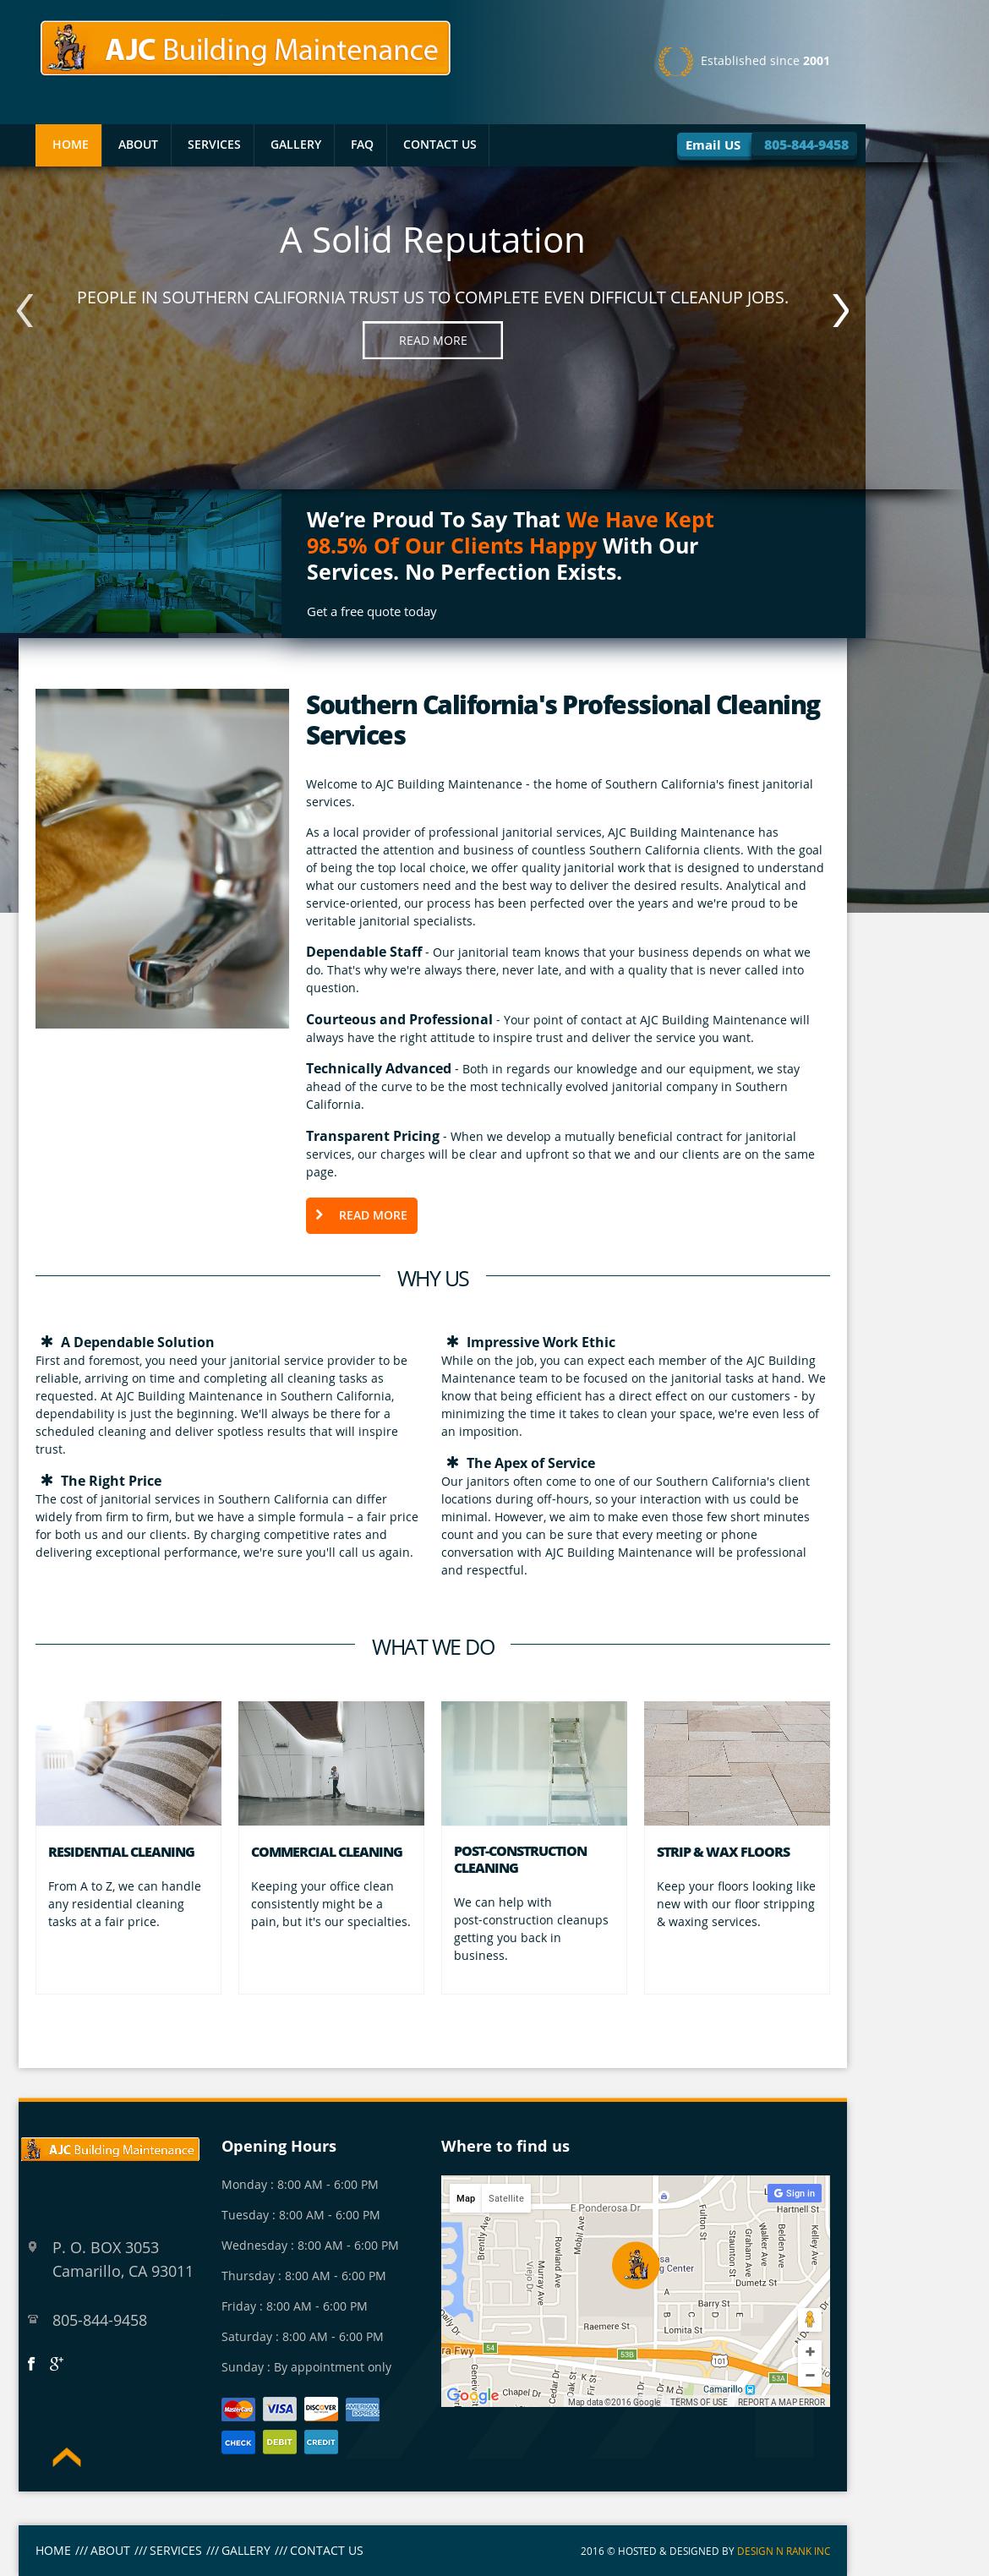 Ajc Building Maintenance Competitors, Revenue and Employees